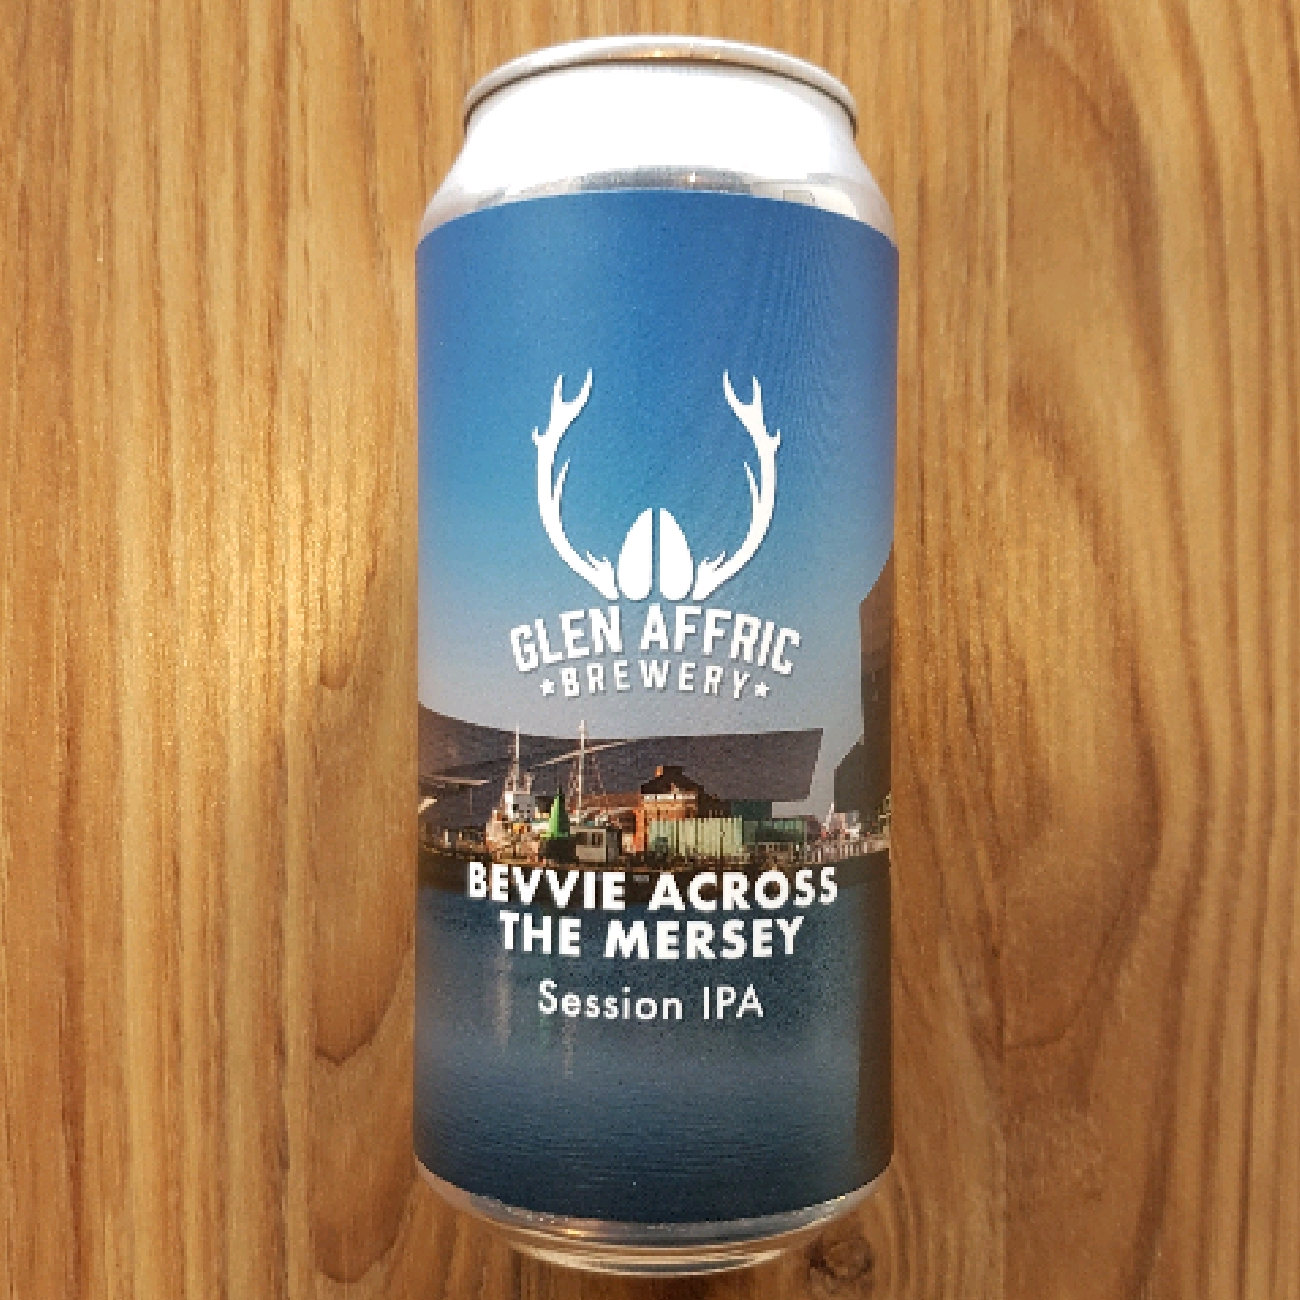 Glen Affric Bevvie Across the Mersey